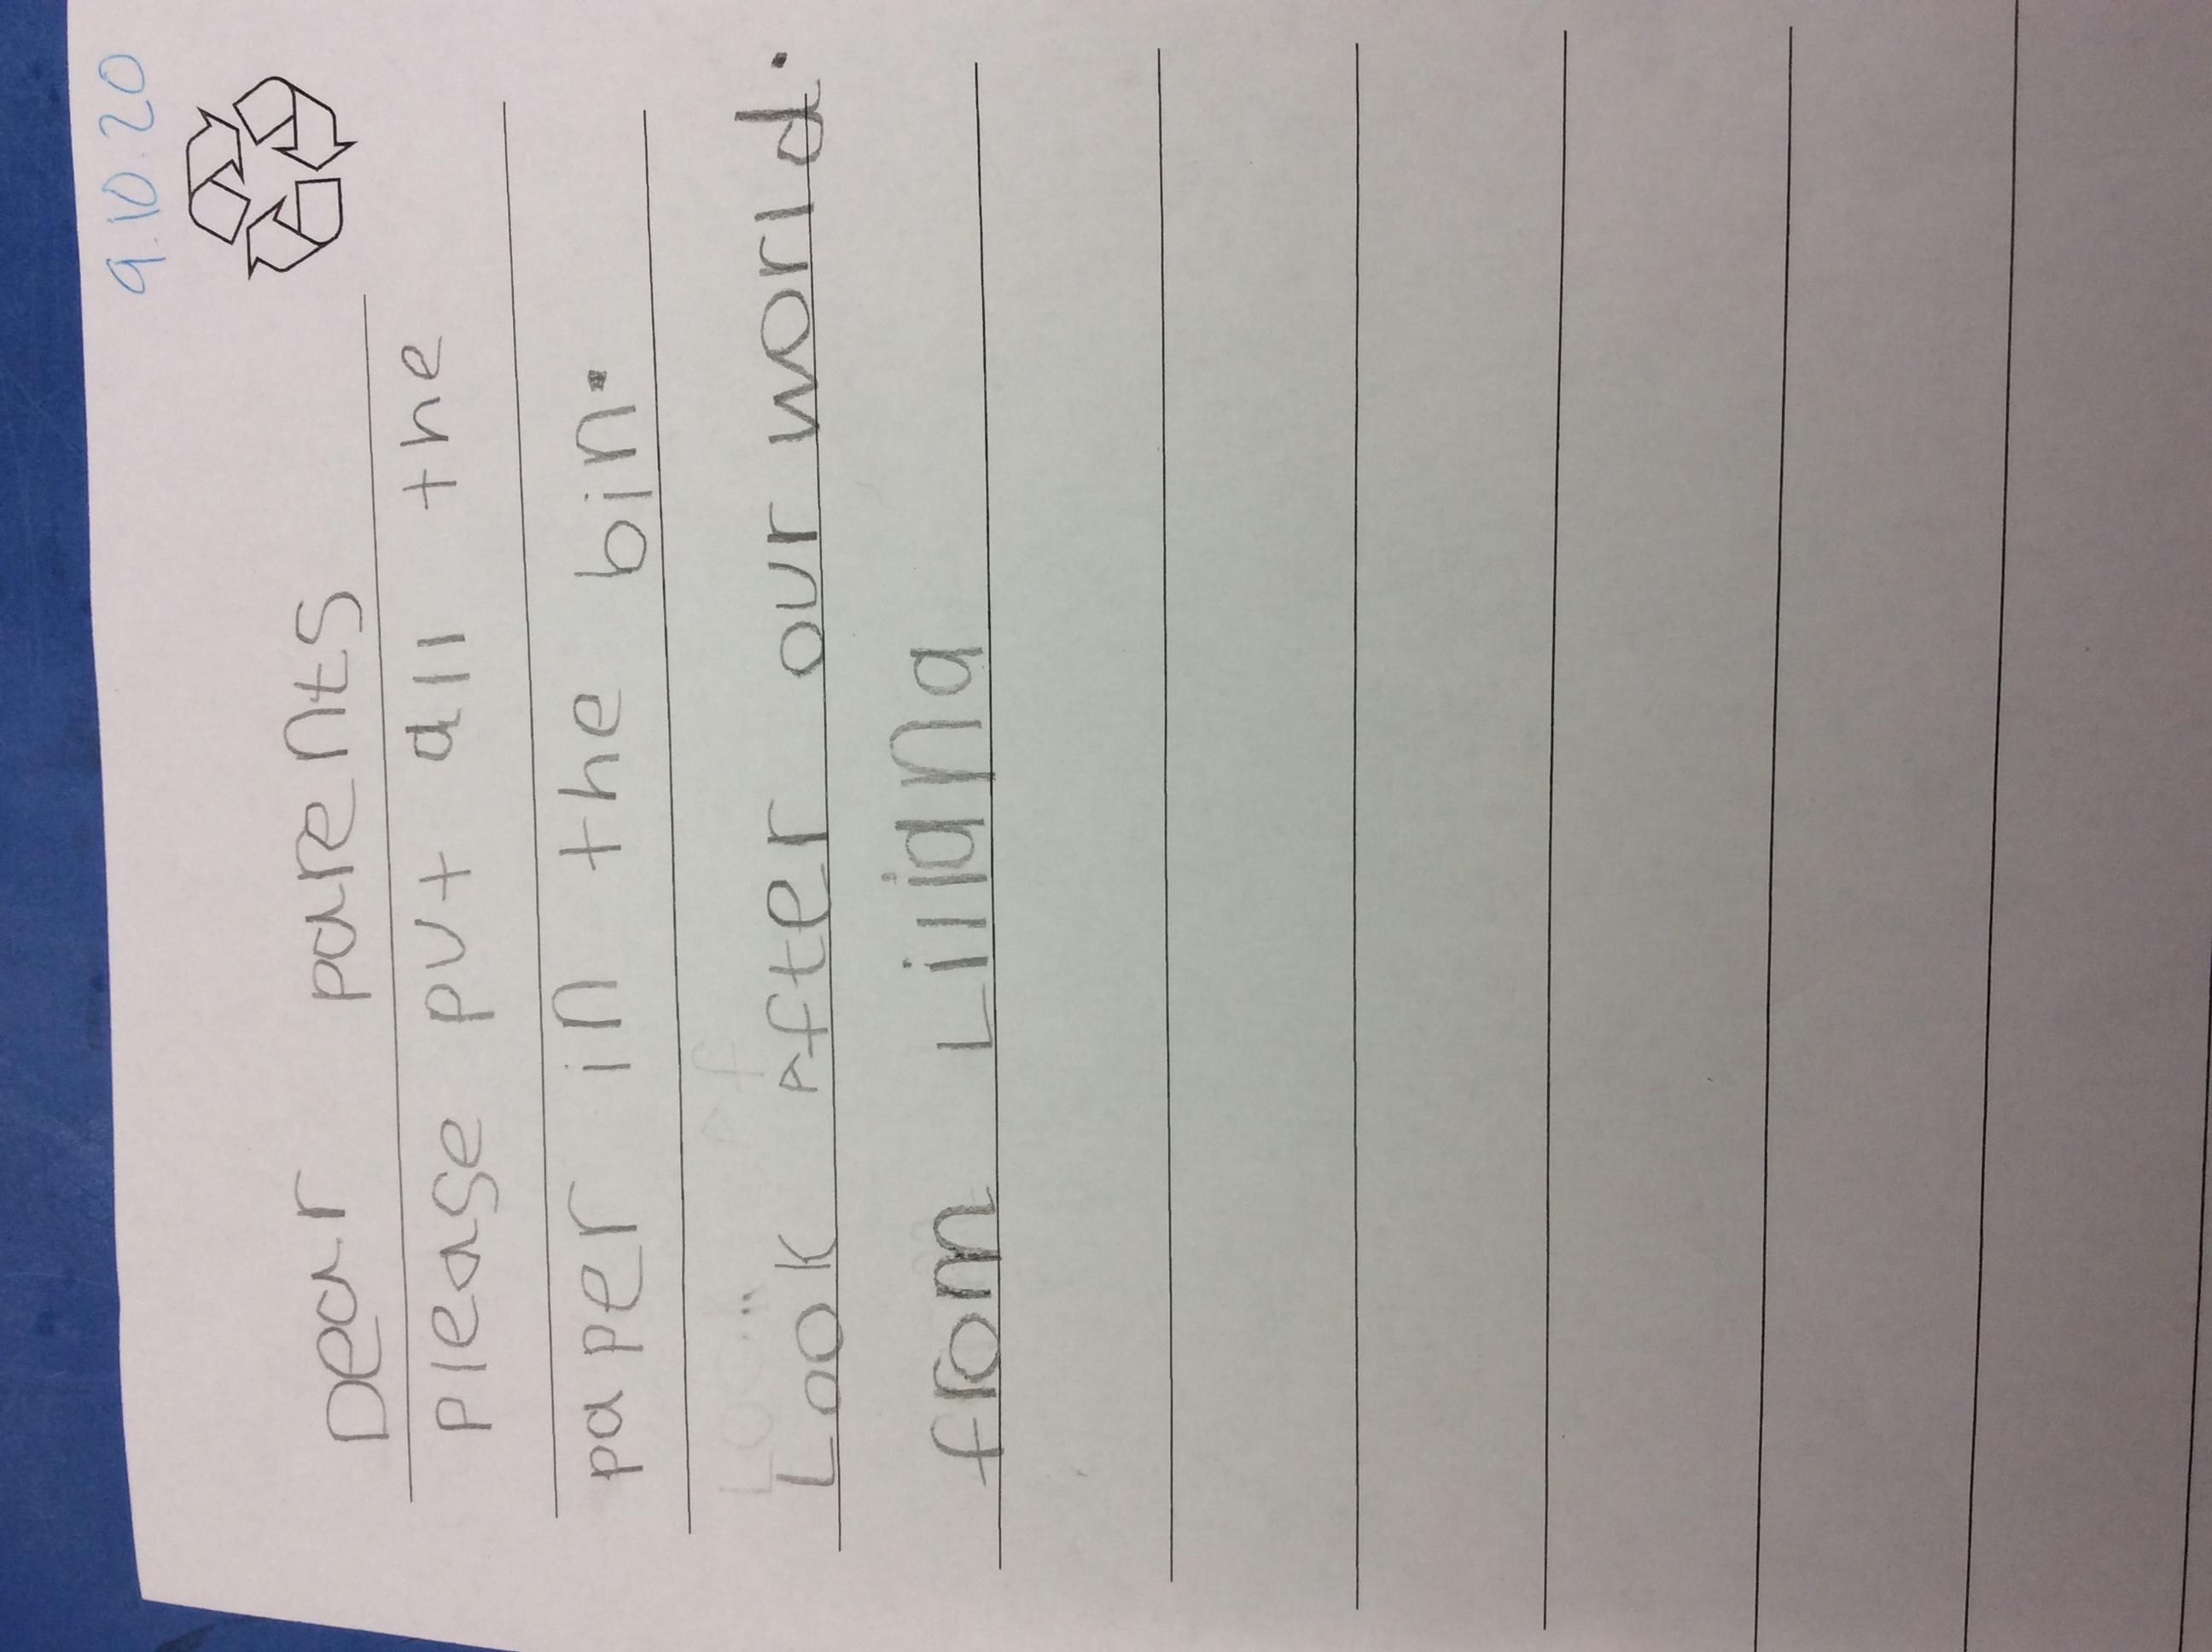 Liliana's fantastic writing!